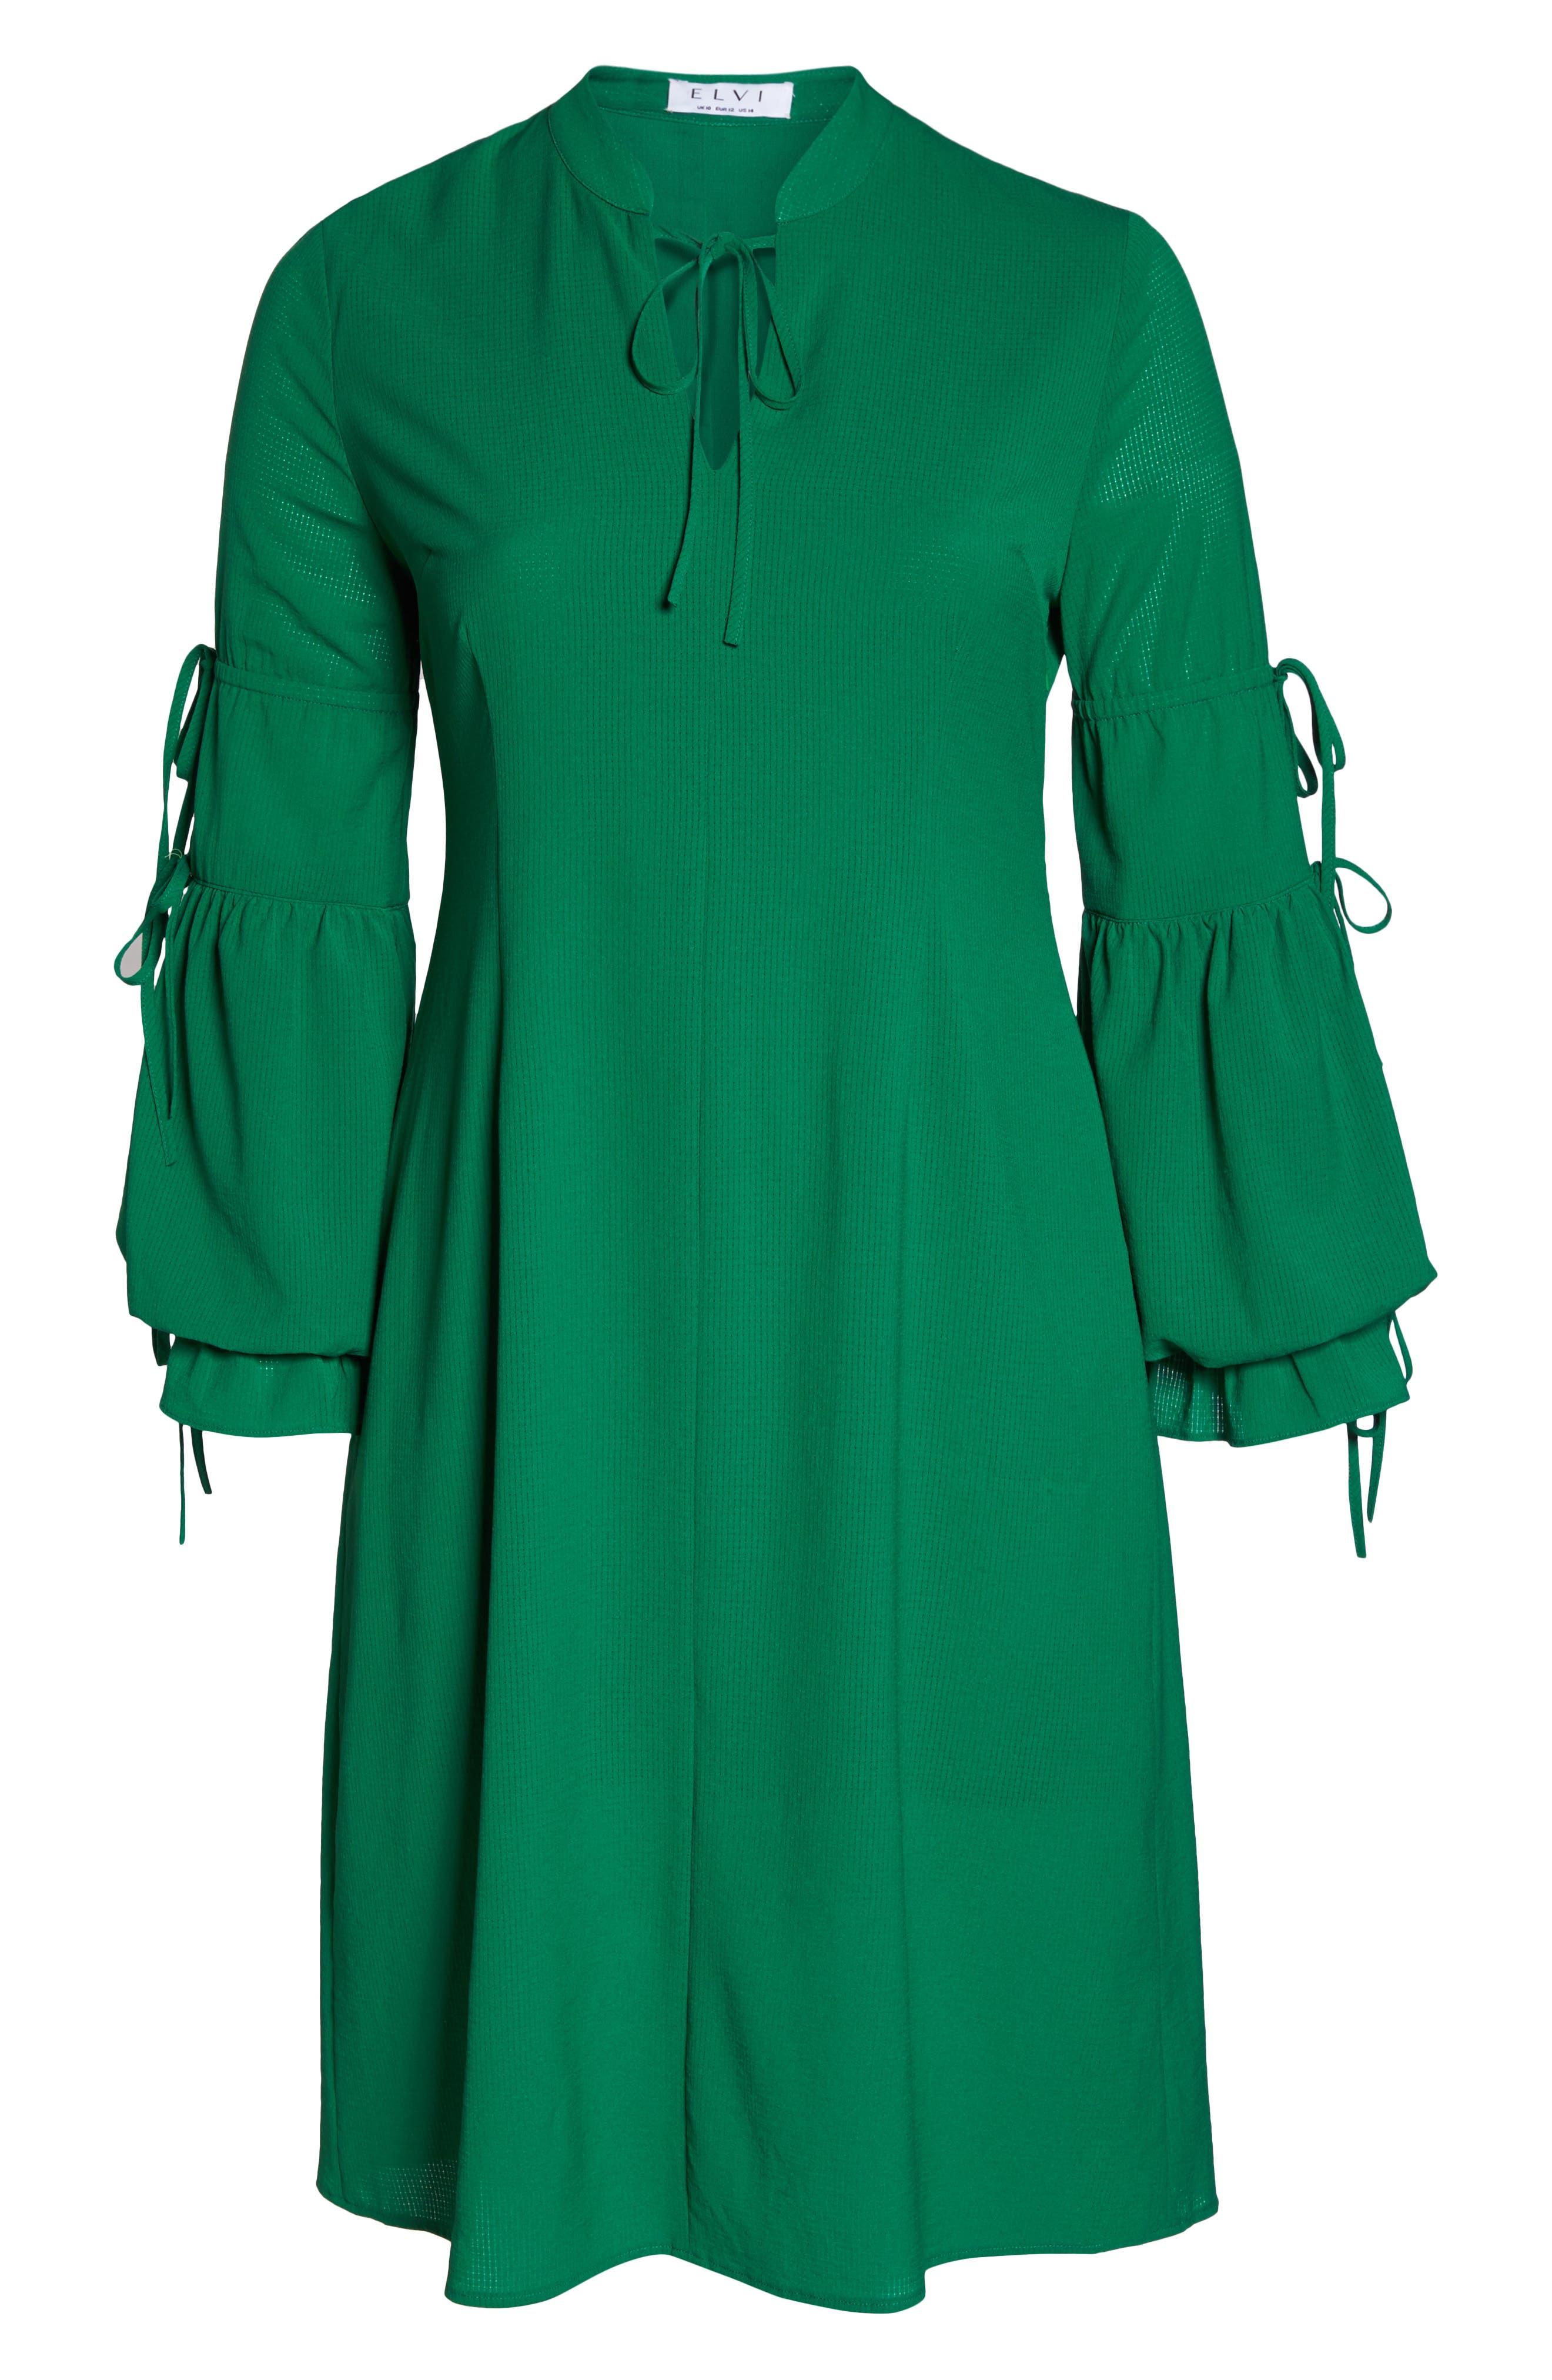 Leiko Antoinette Puff Sleeve Tea Dress,                             Alternate thumbnail 6, color,                             300